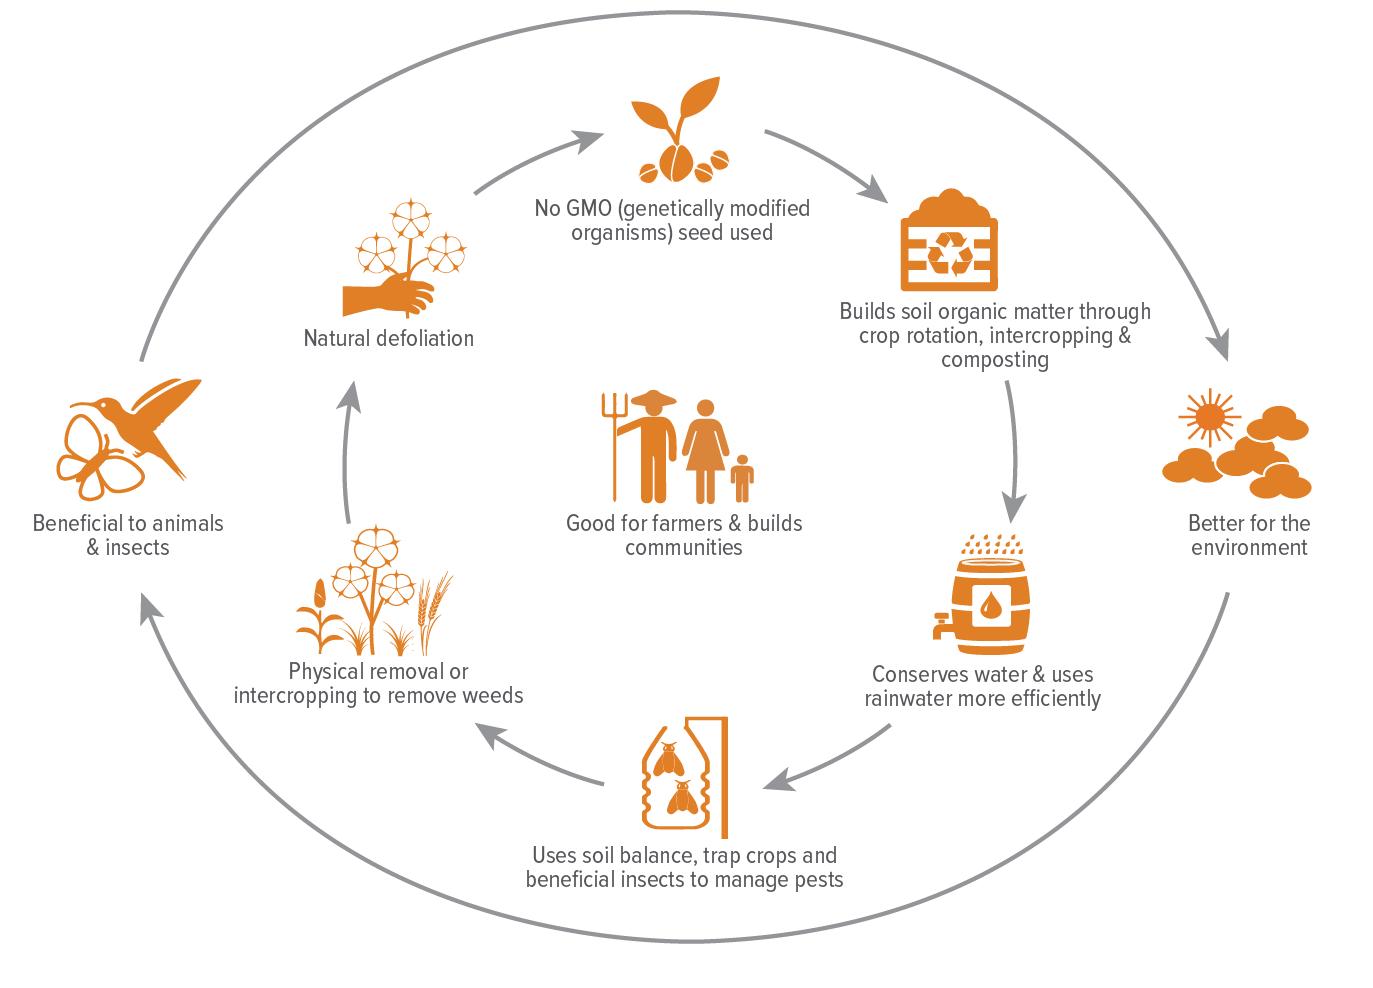 Diagram showing benefits of organic cotton